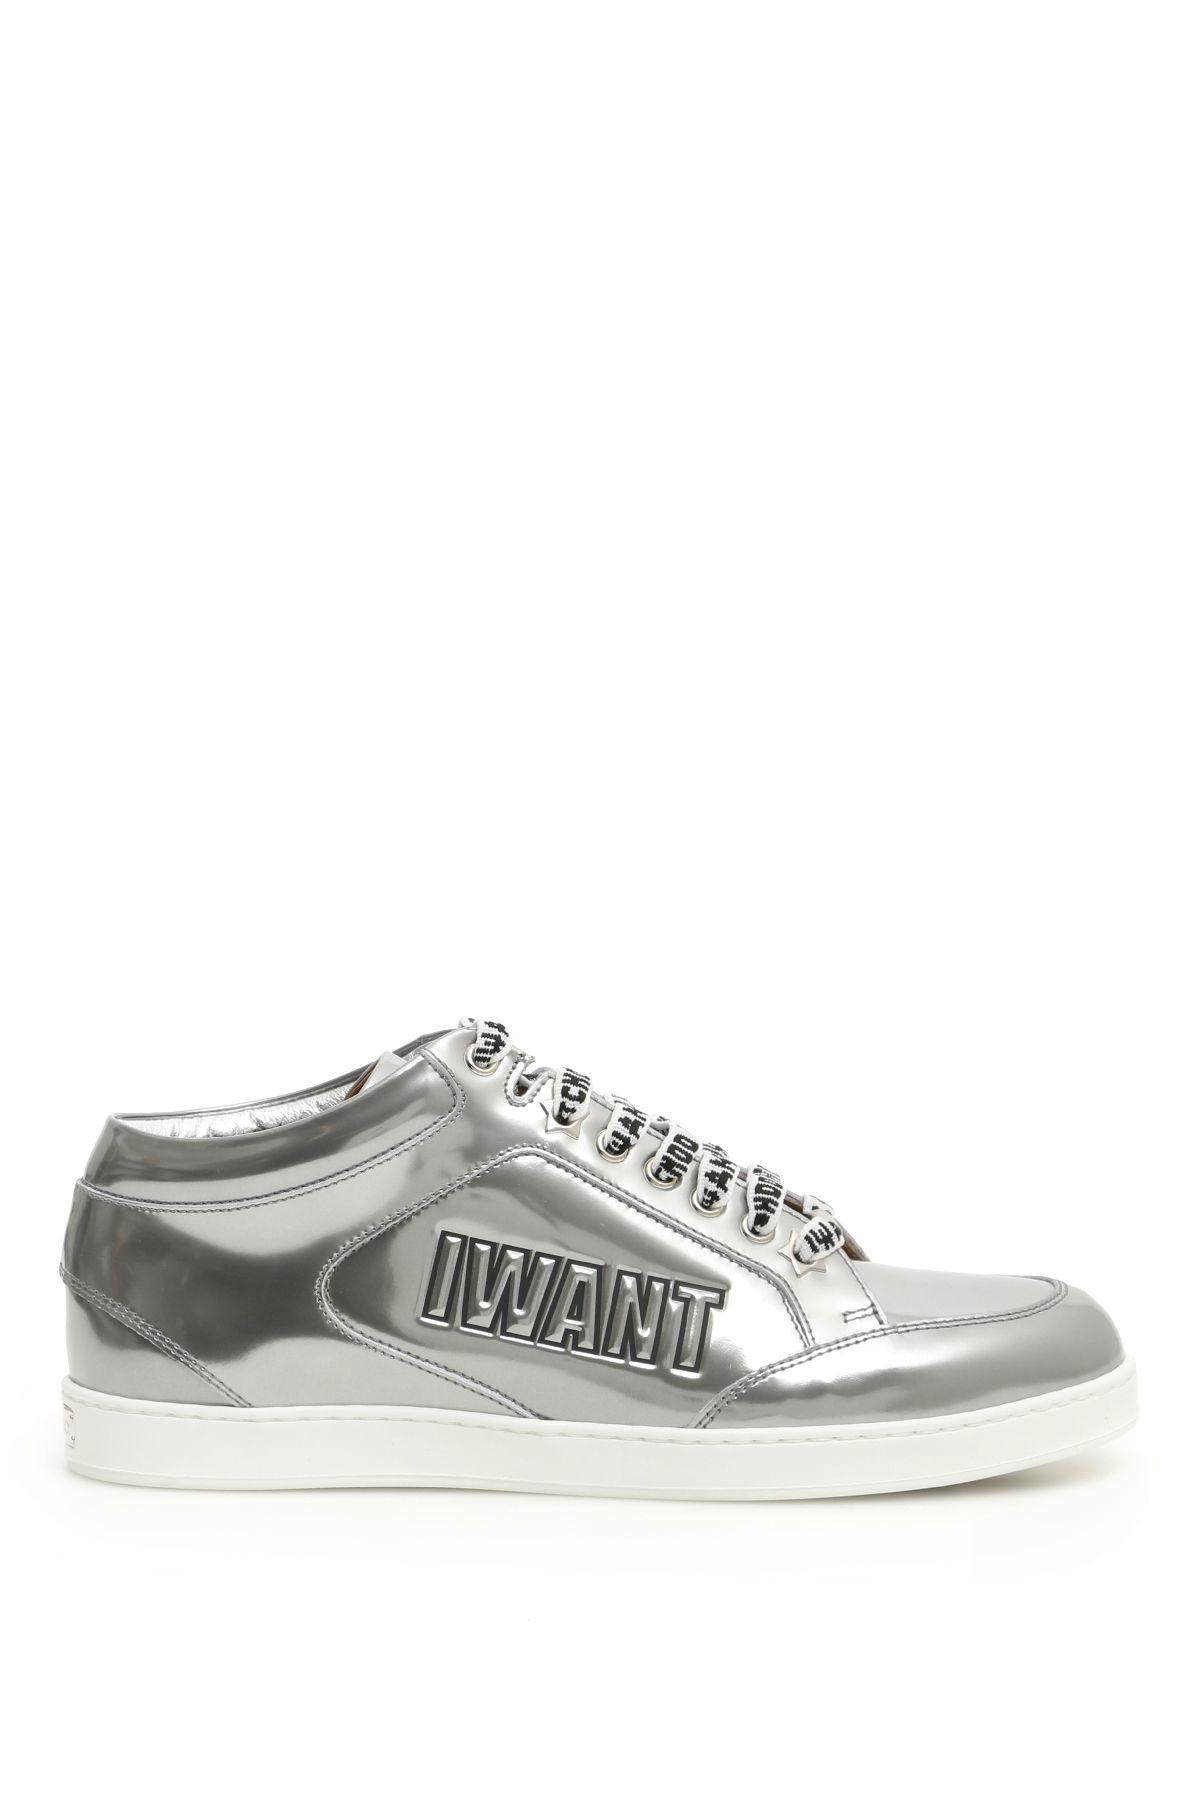 0d982ba2f2ff Jimmy Choo Jimmy Choo Miami Logo Sneakers - Basic - 10783293